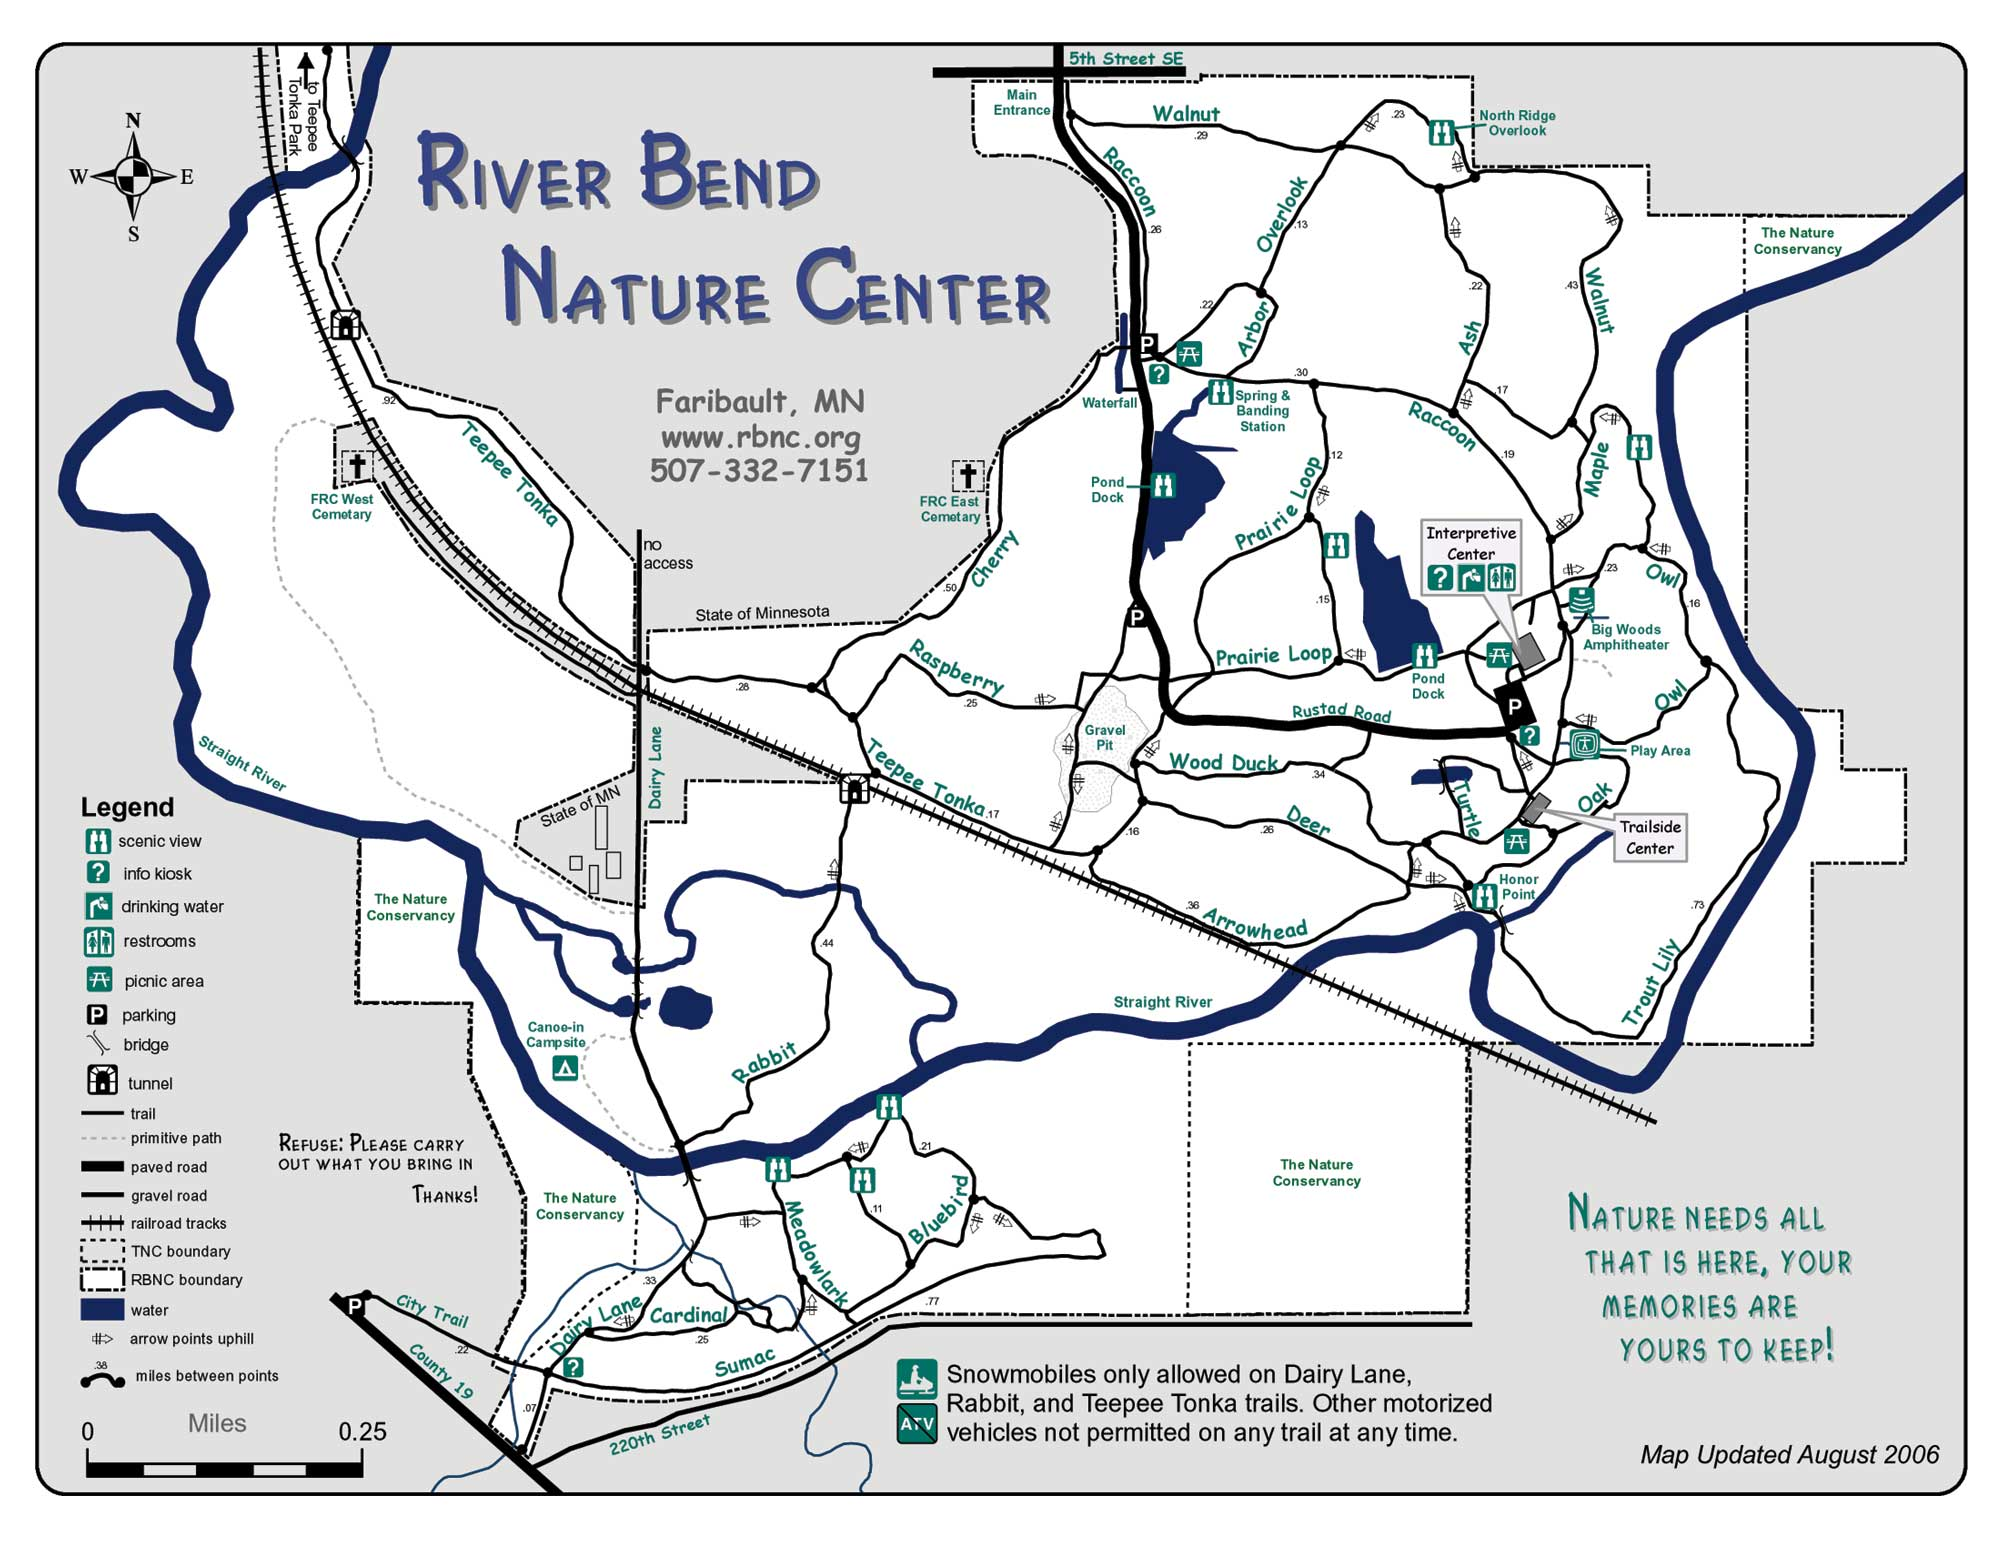 Riverbend Nature Center